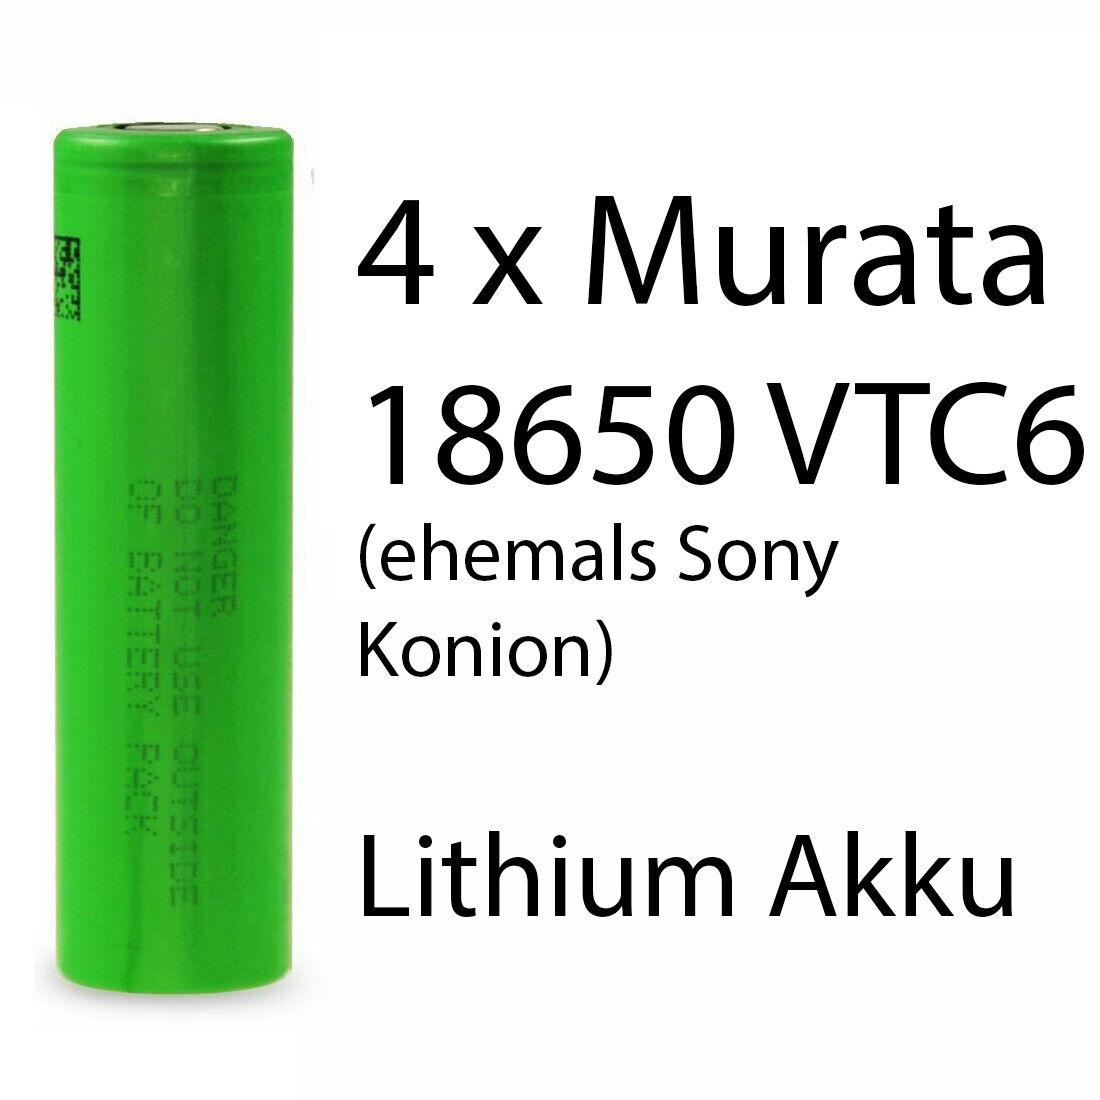 3120mAh//3,7V//30A 2 VTC6 Akkus INR f/ür E-Zigarette Batterien Akku Dampfen